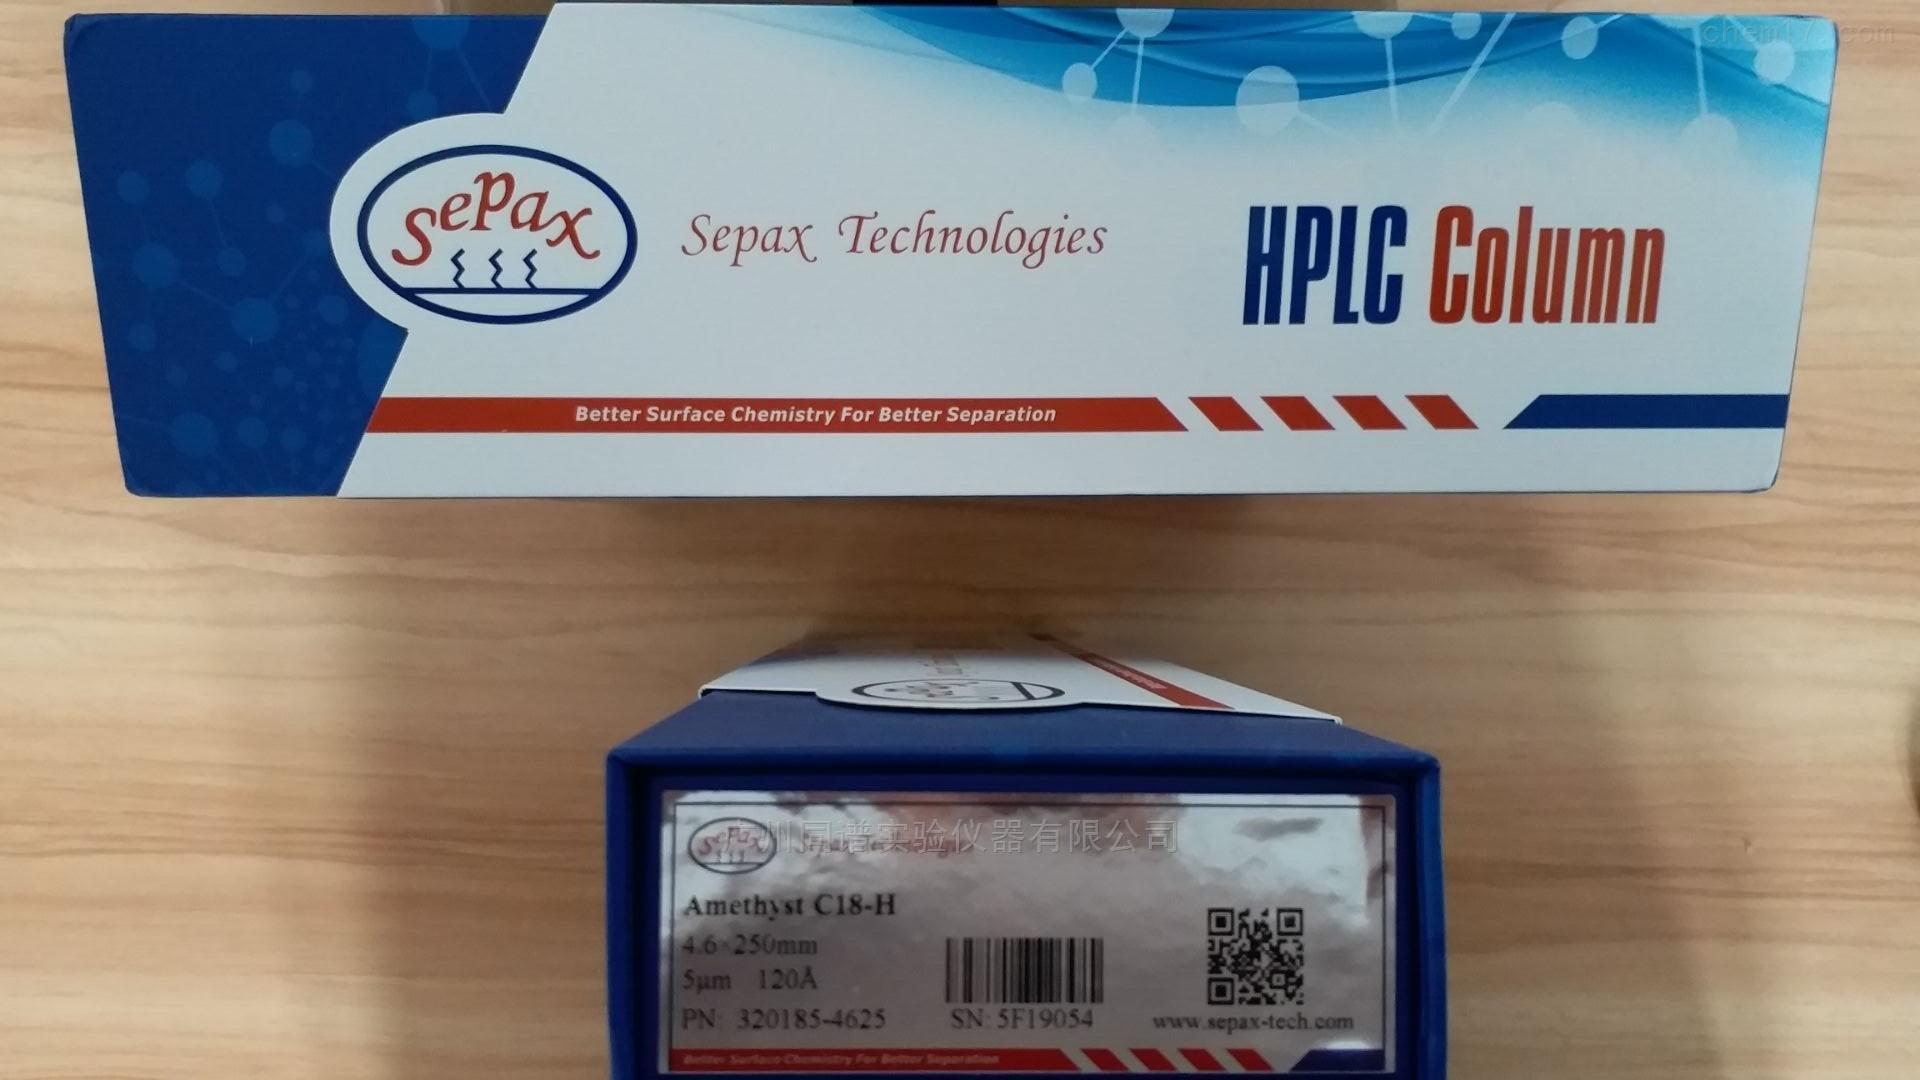 Sepax Amethyst C18-H 赛分液相色谱柱